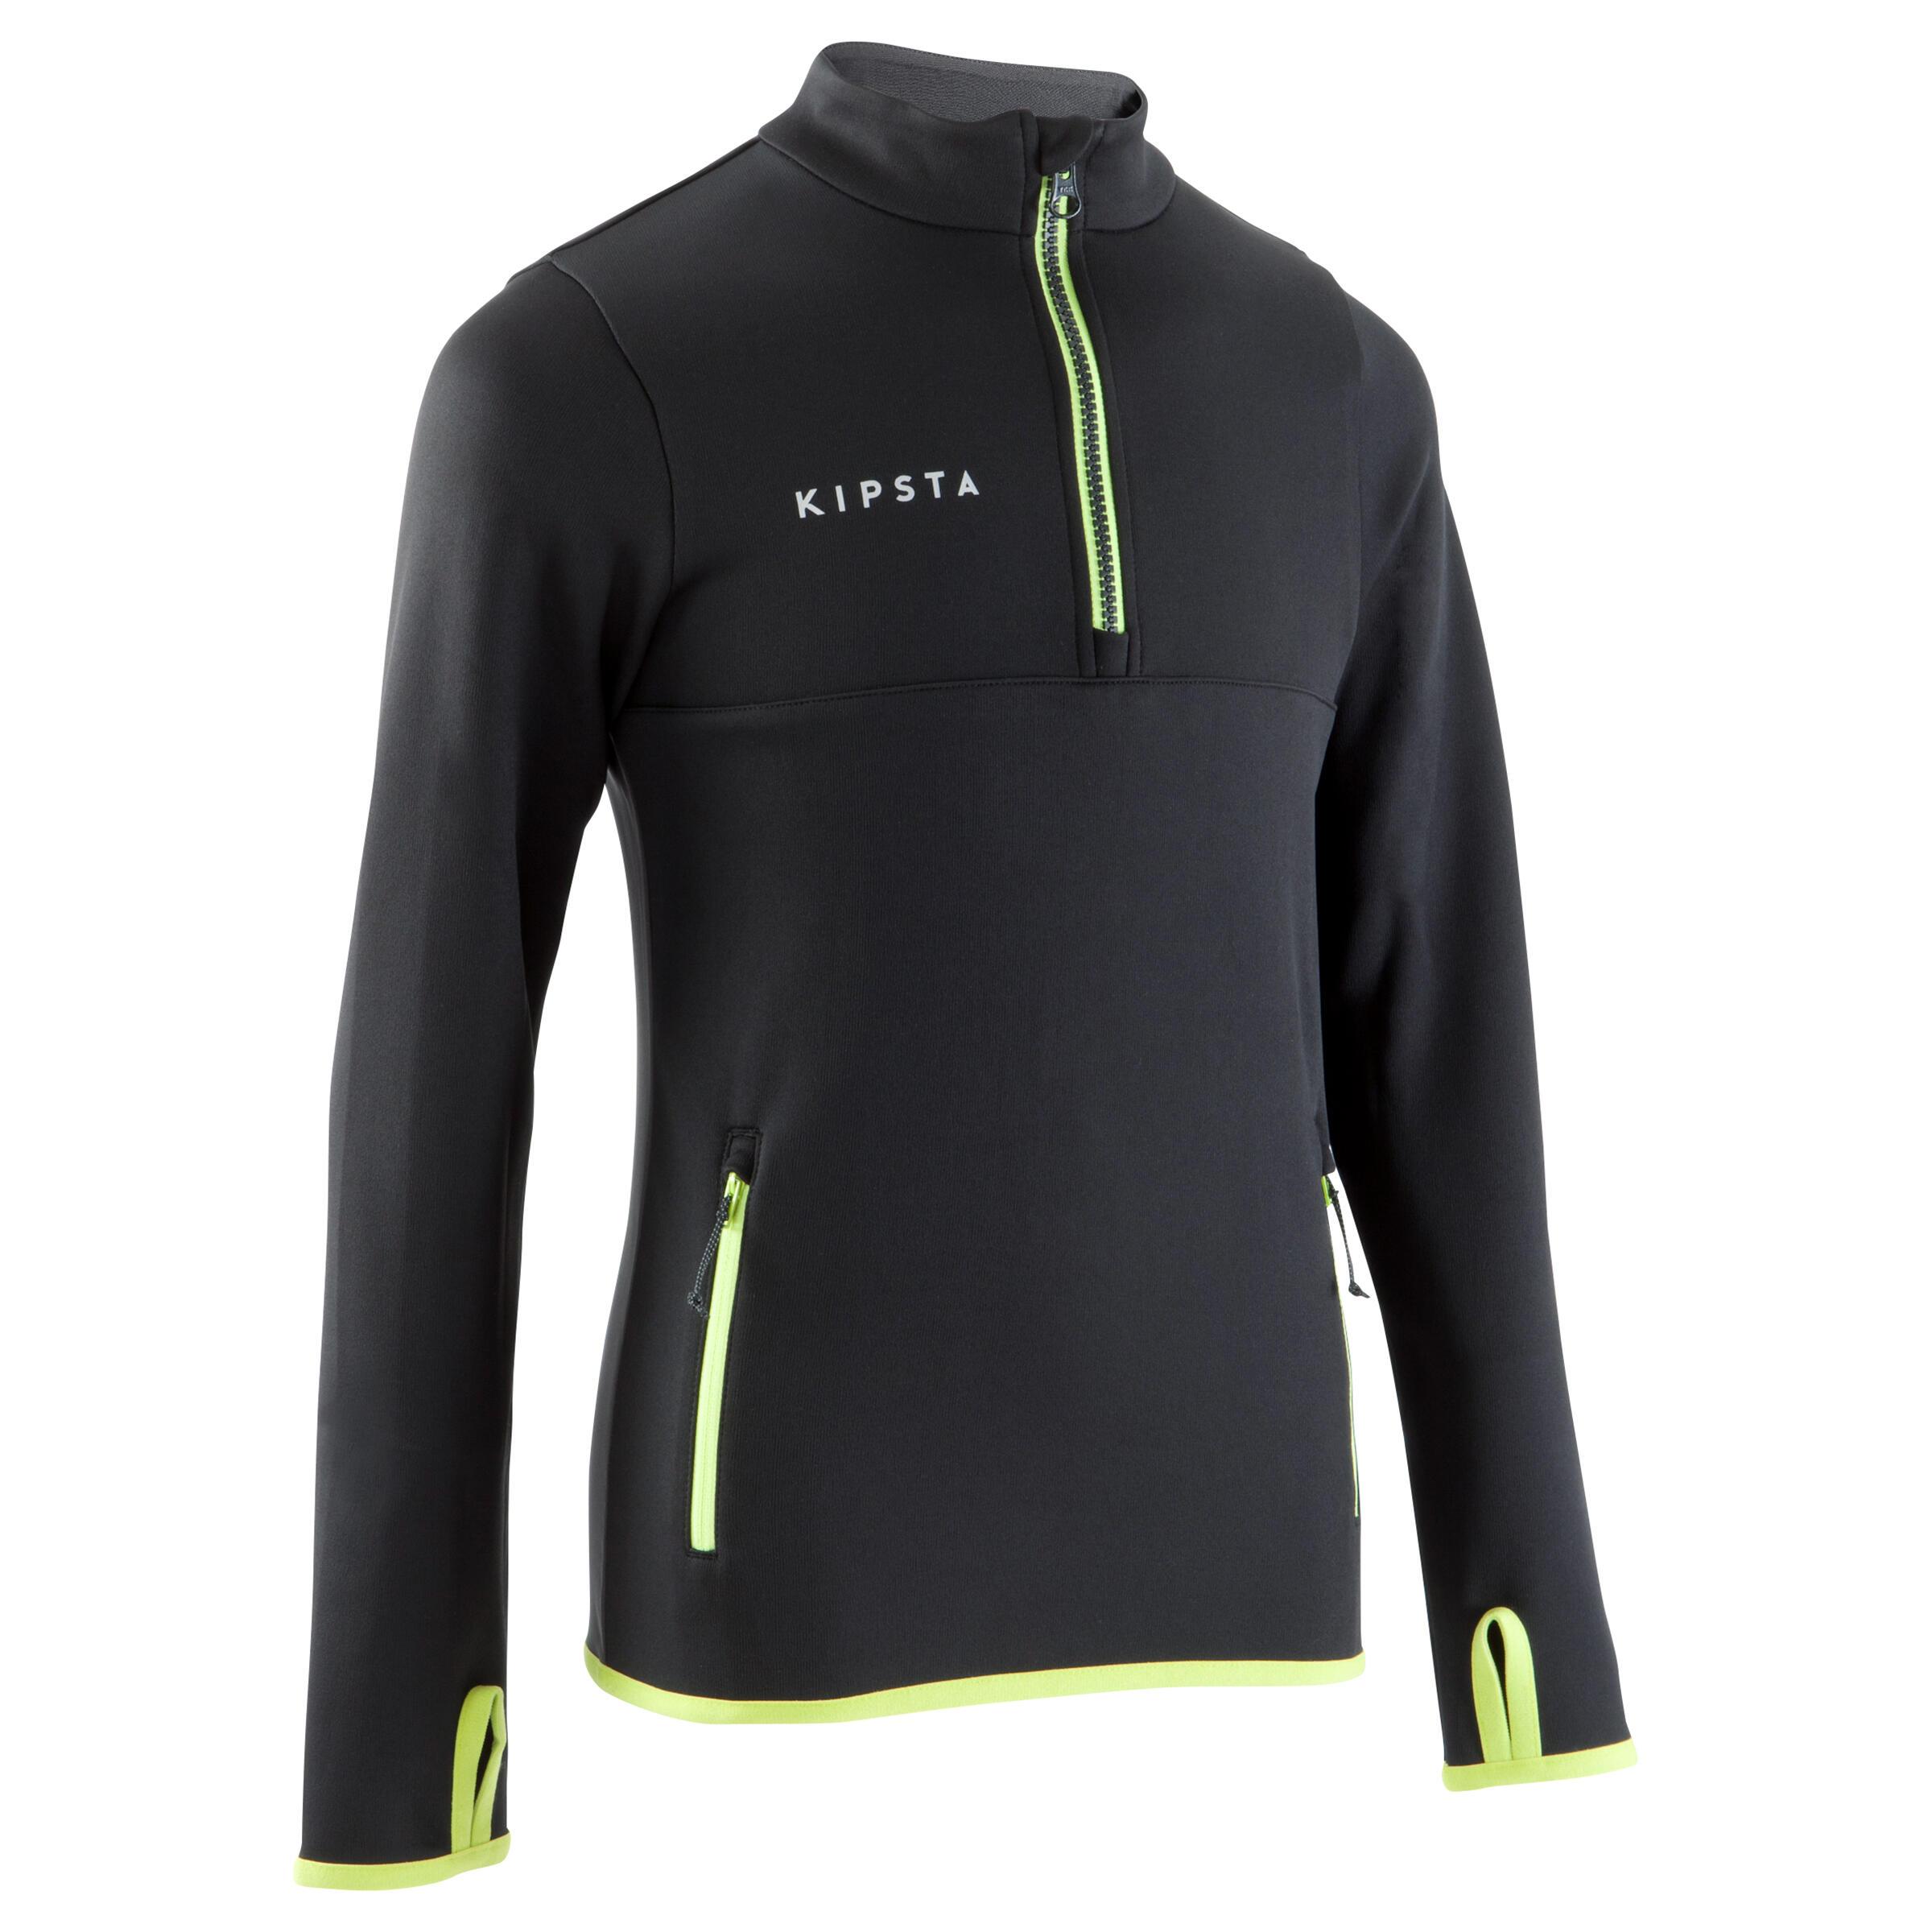 b50b9f58869700 Sweatshirts jongens | Decathlon